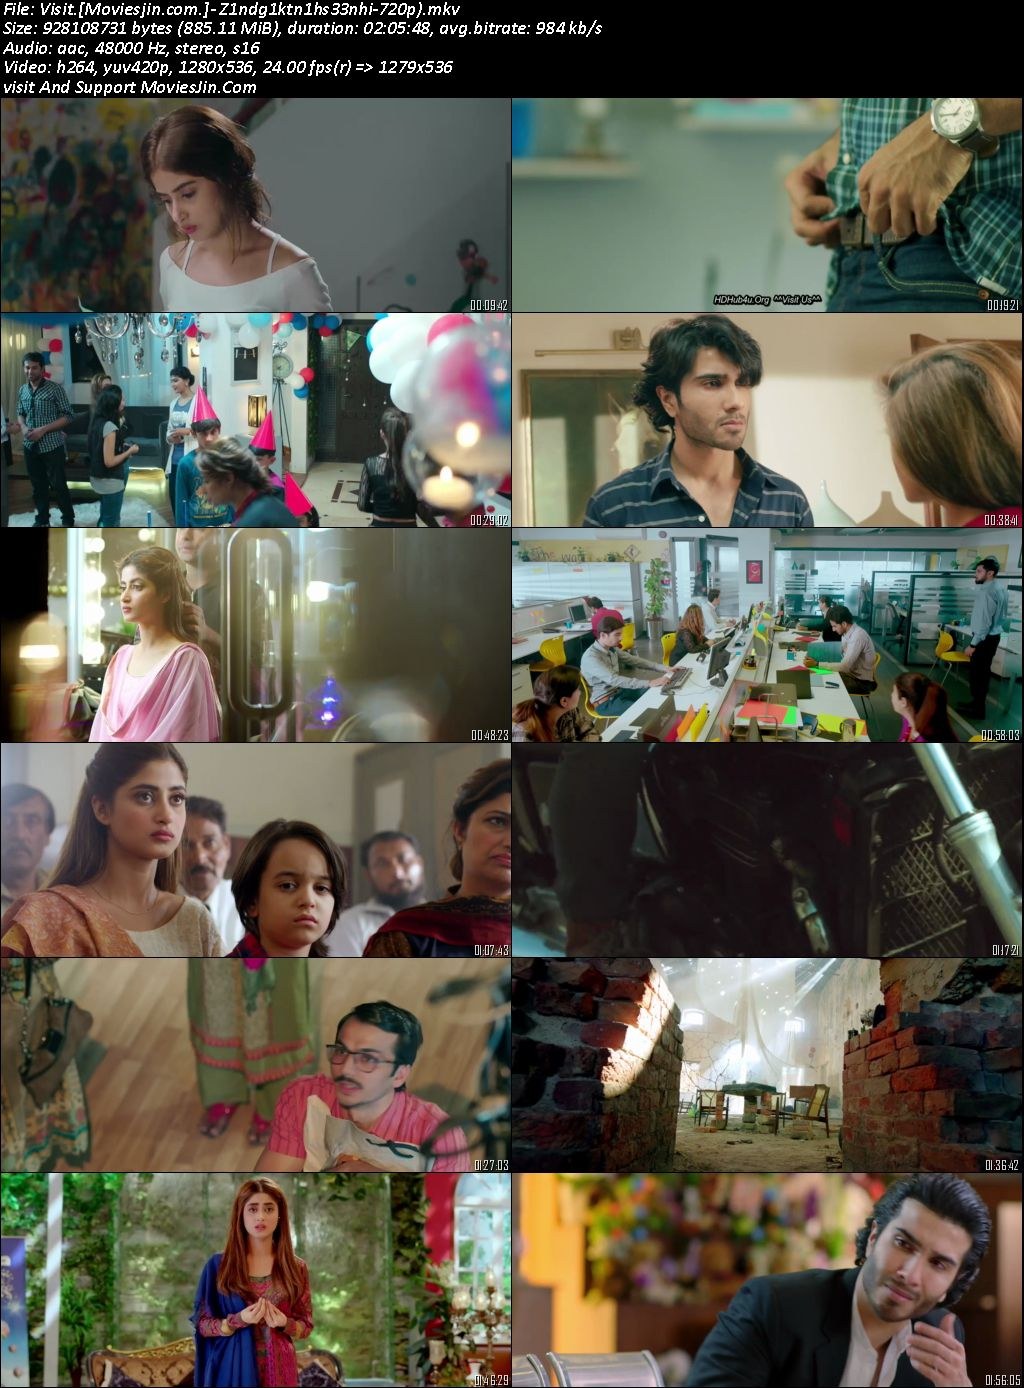 Zindagi Kitni Haseen Hy 2016 Pakistani 720p HDrip 800MB